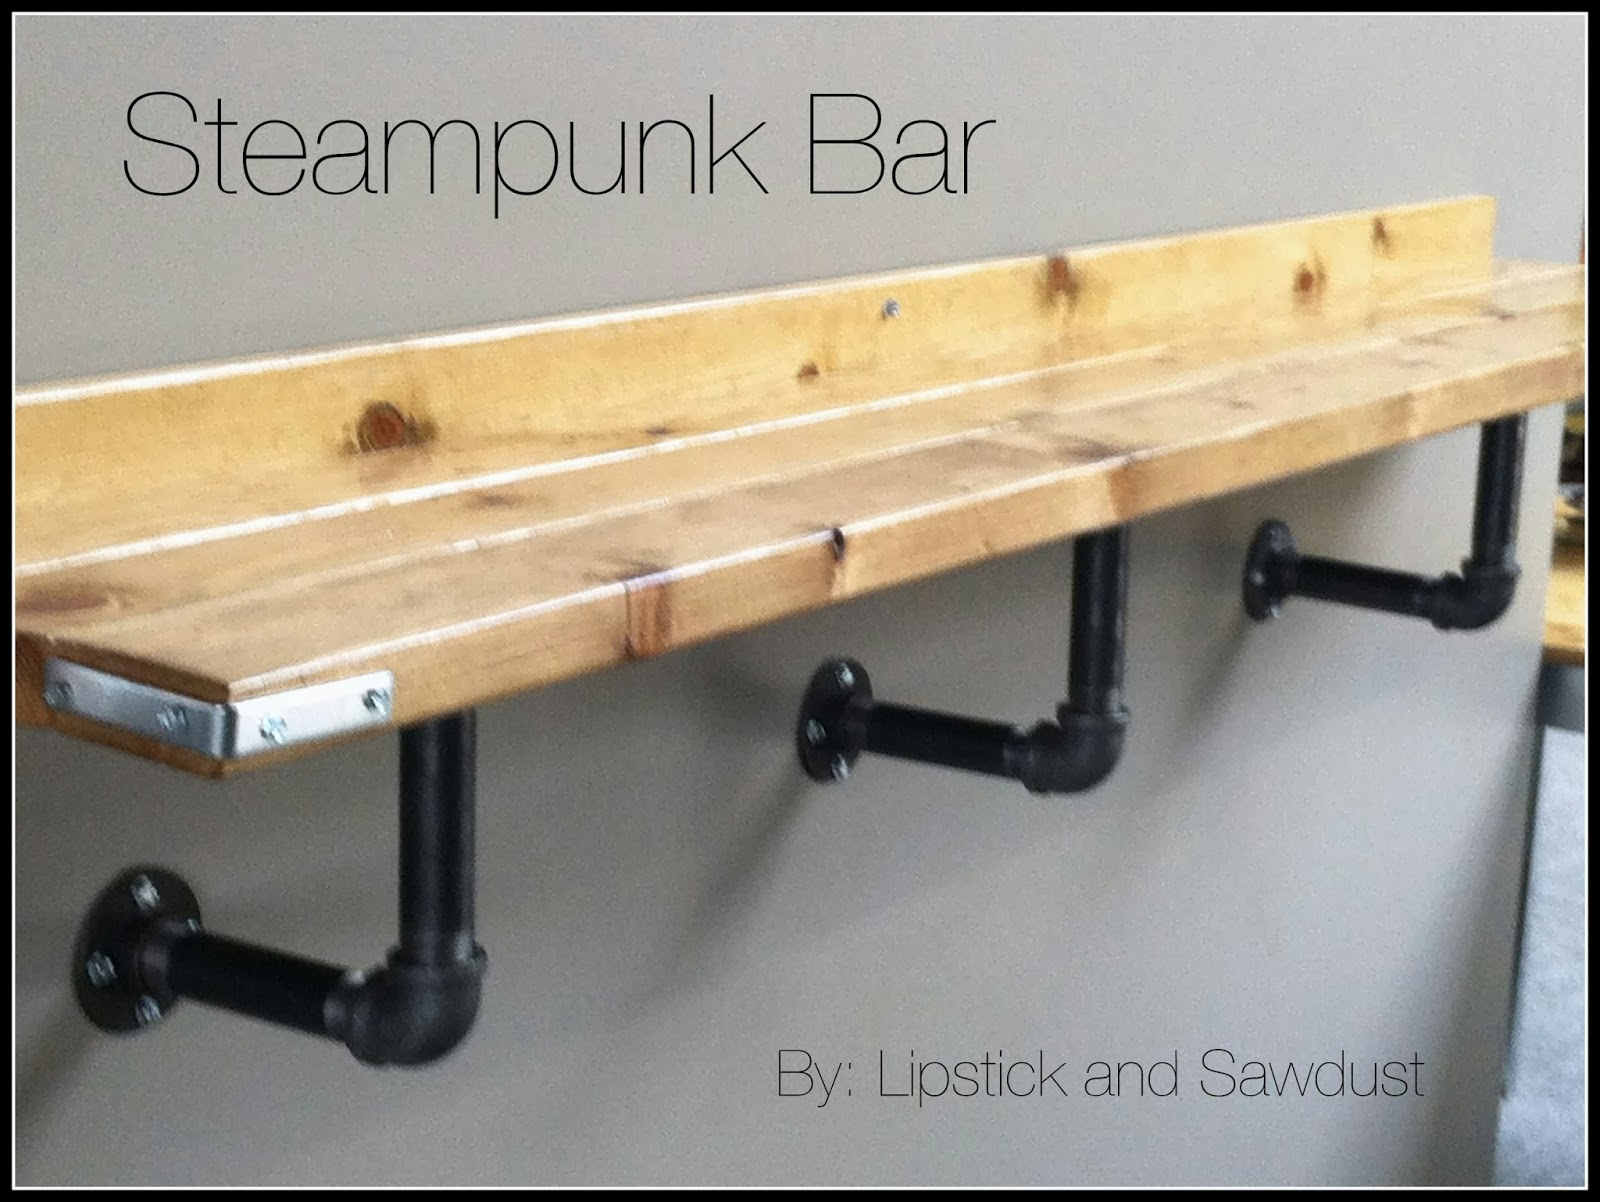 Lipstick and sawdust easy steampunk bar ledge tutorial